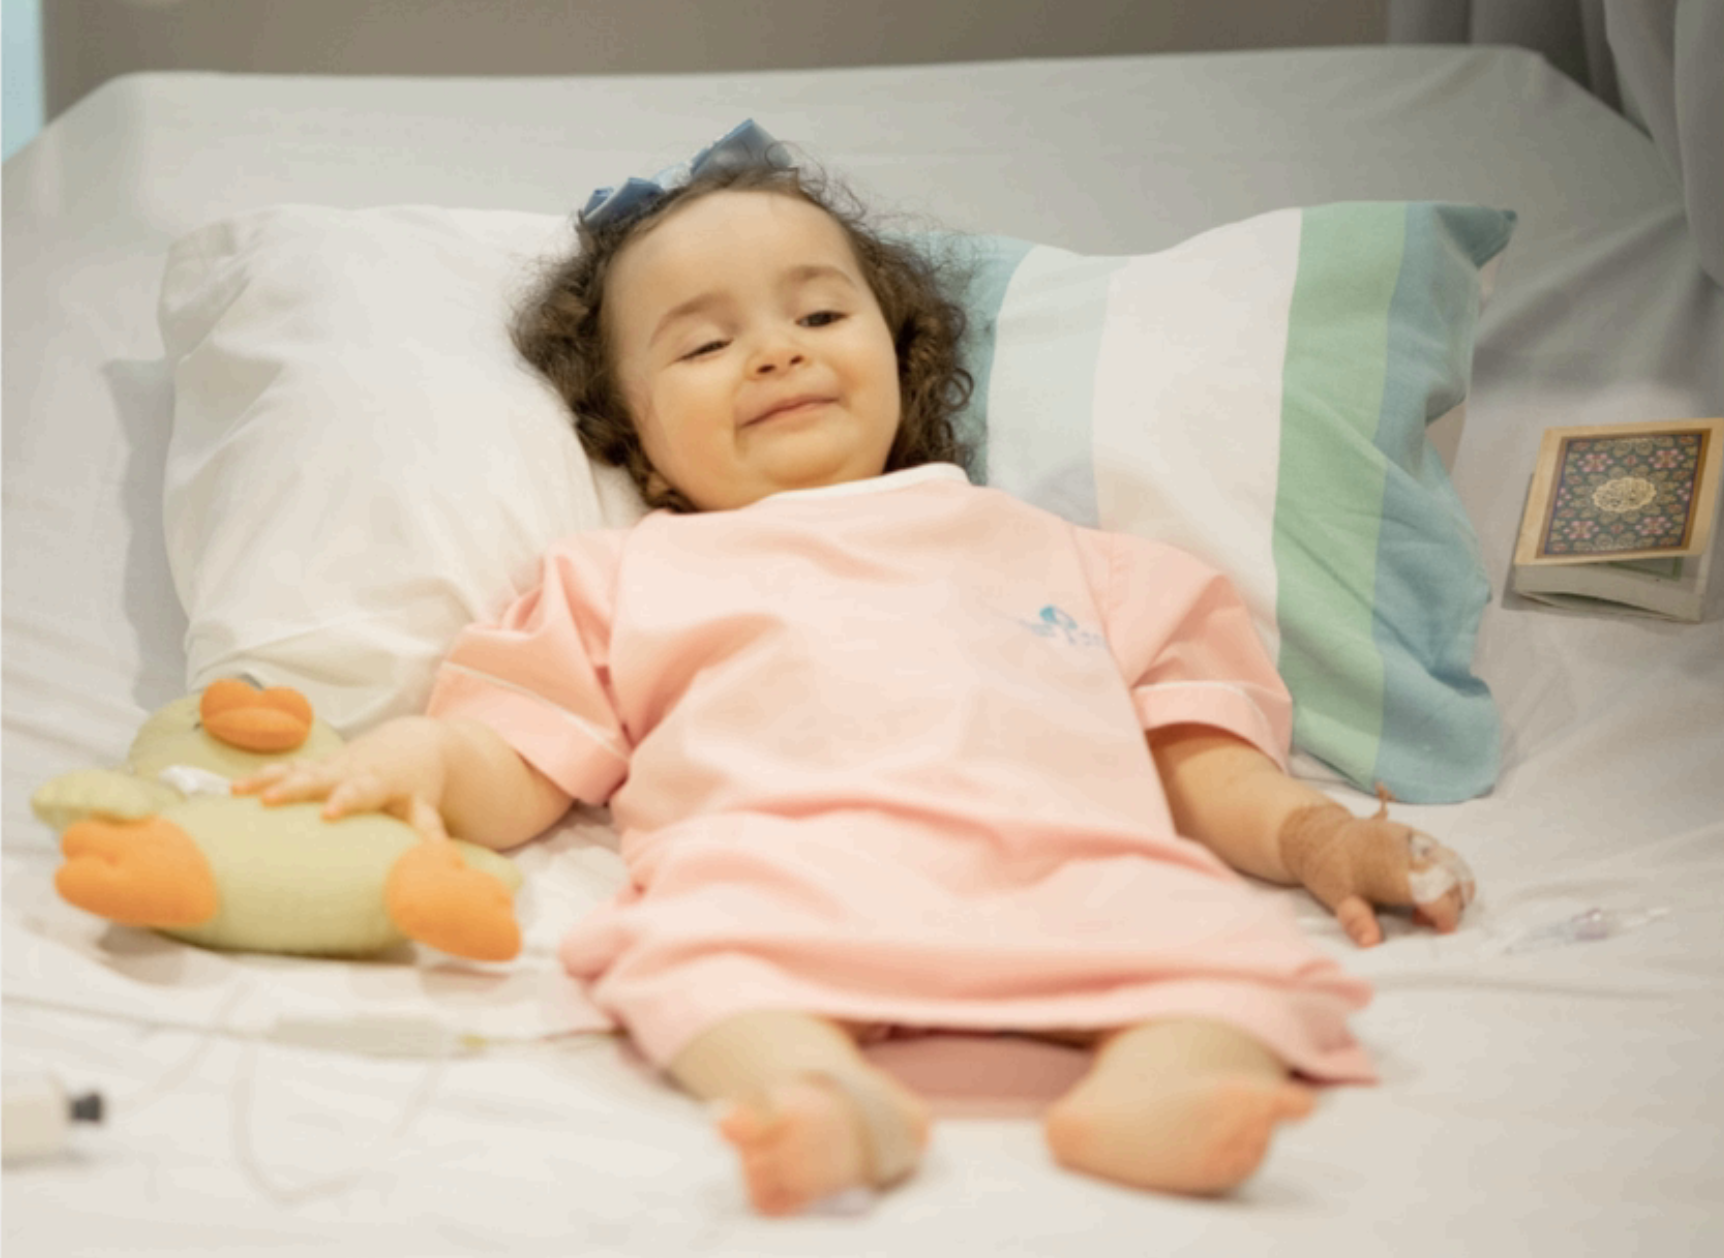 UAE: Sheikh Mohammed's Dh8m help saves Iraqi baby's life